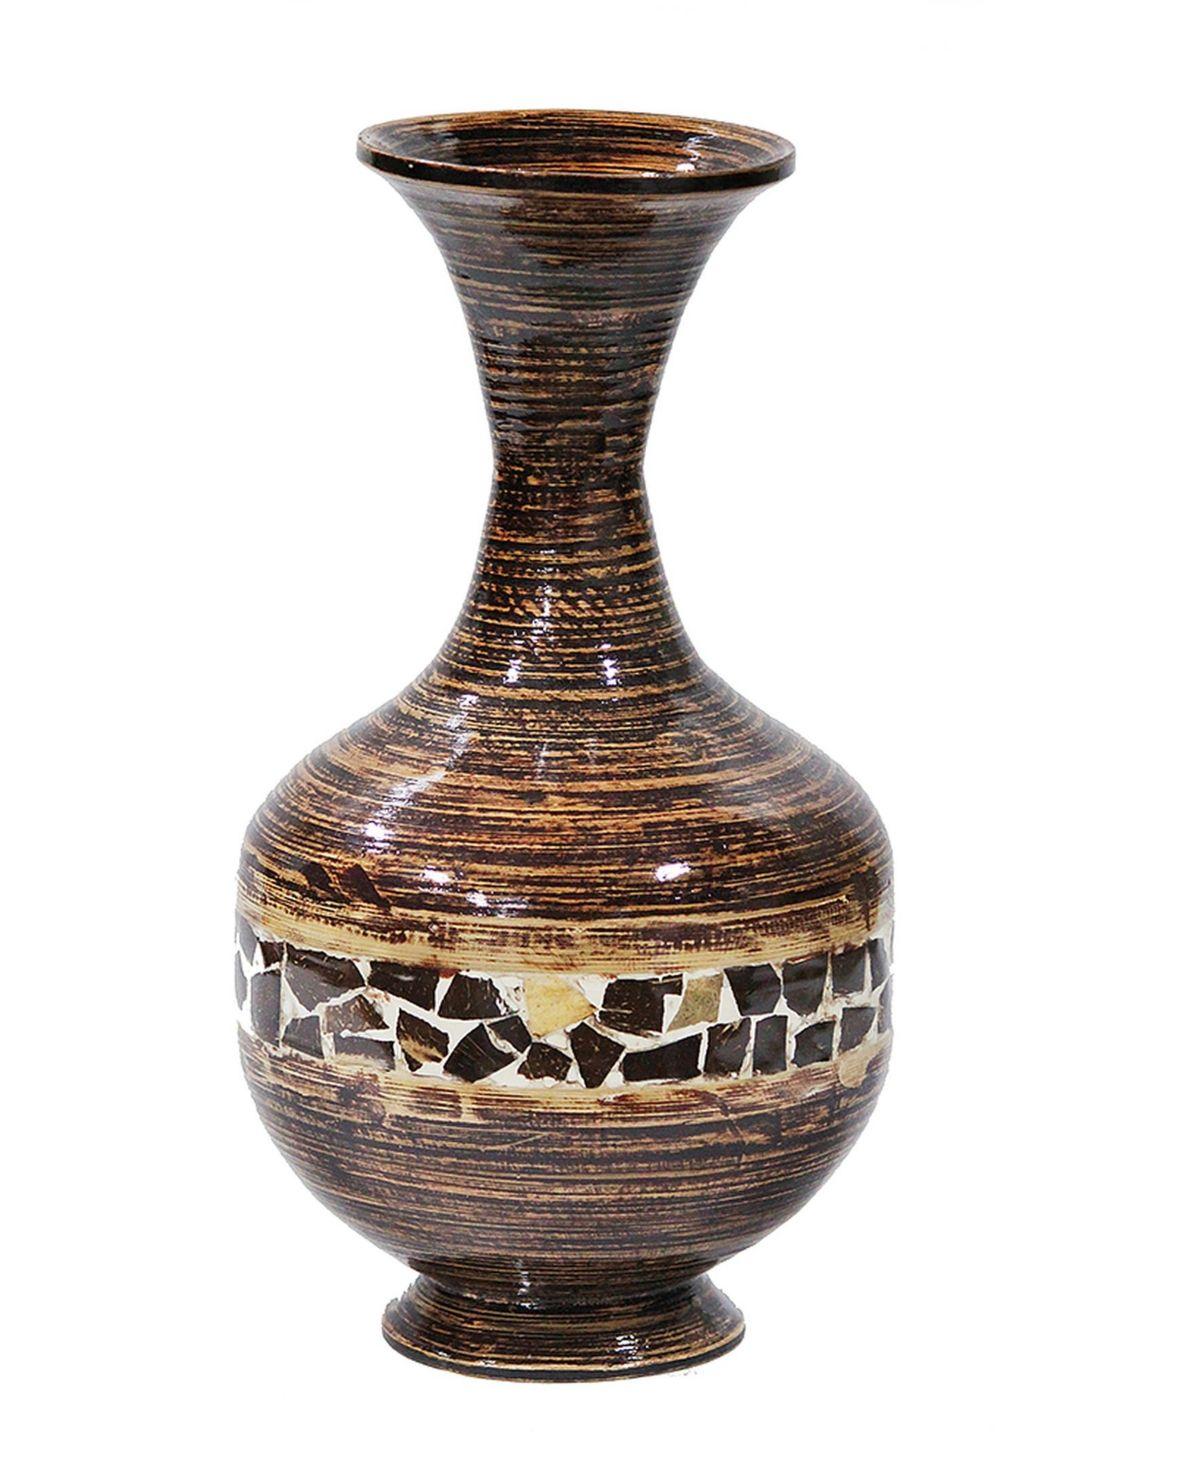 Heather Ann Creations Cora 22 Bamboo Vase Reviews Vases Home Decor Macy S Floor Vase Bamboo Flooring Large Vase